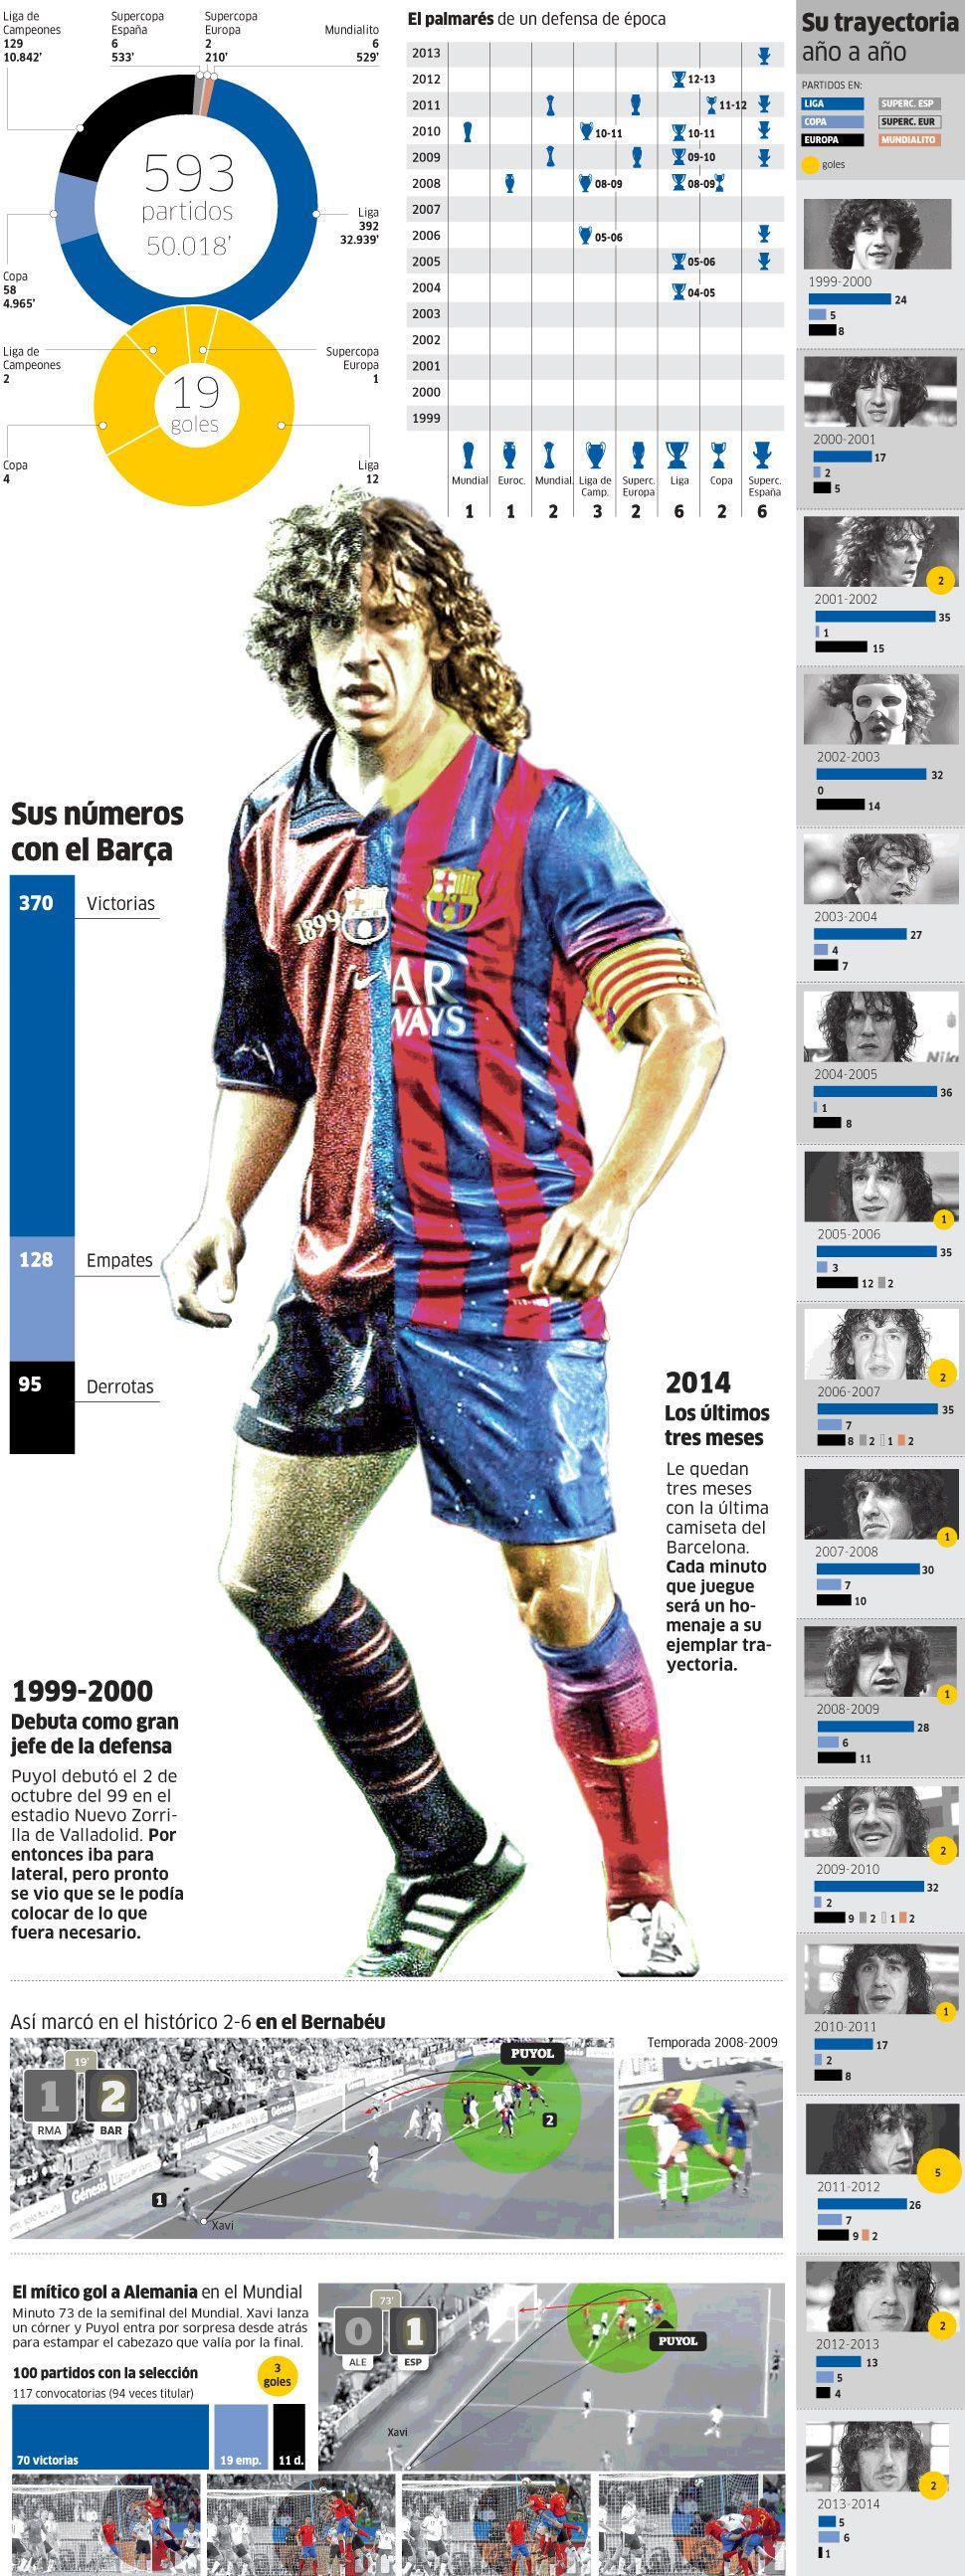 Carles Puyol. FC Barcelona, España.